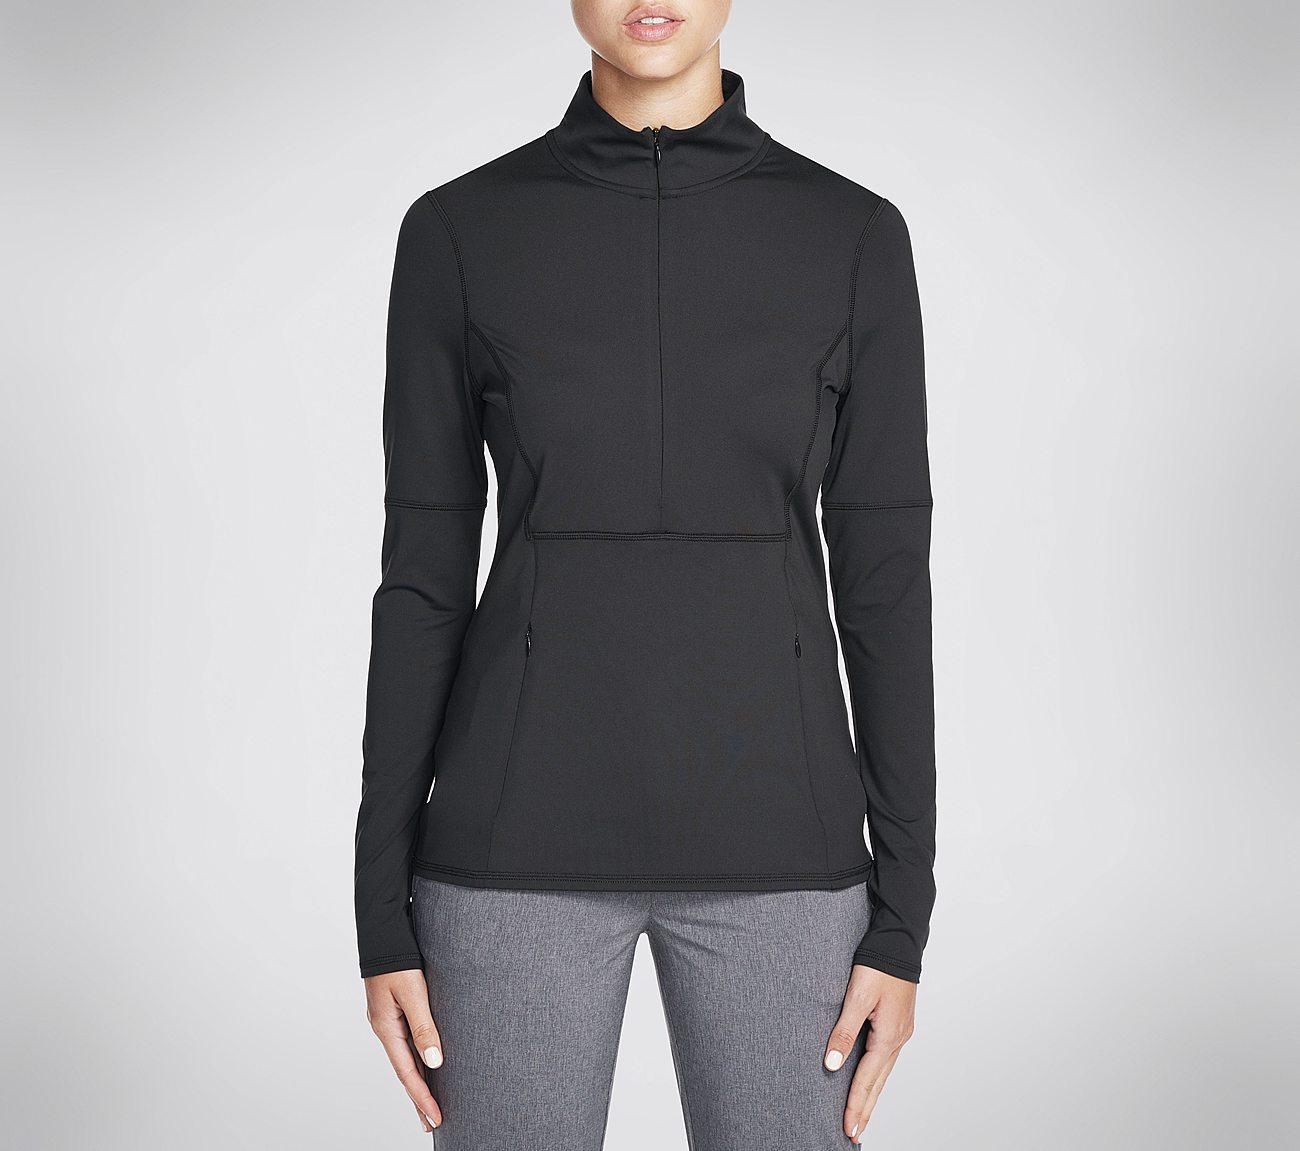 Skechers GOGOLF Course Long Sleeve Shirt